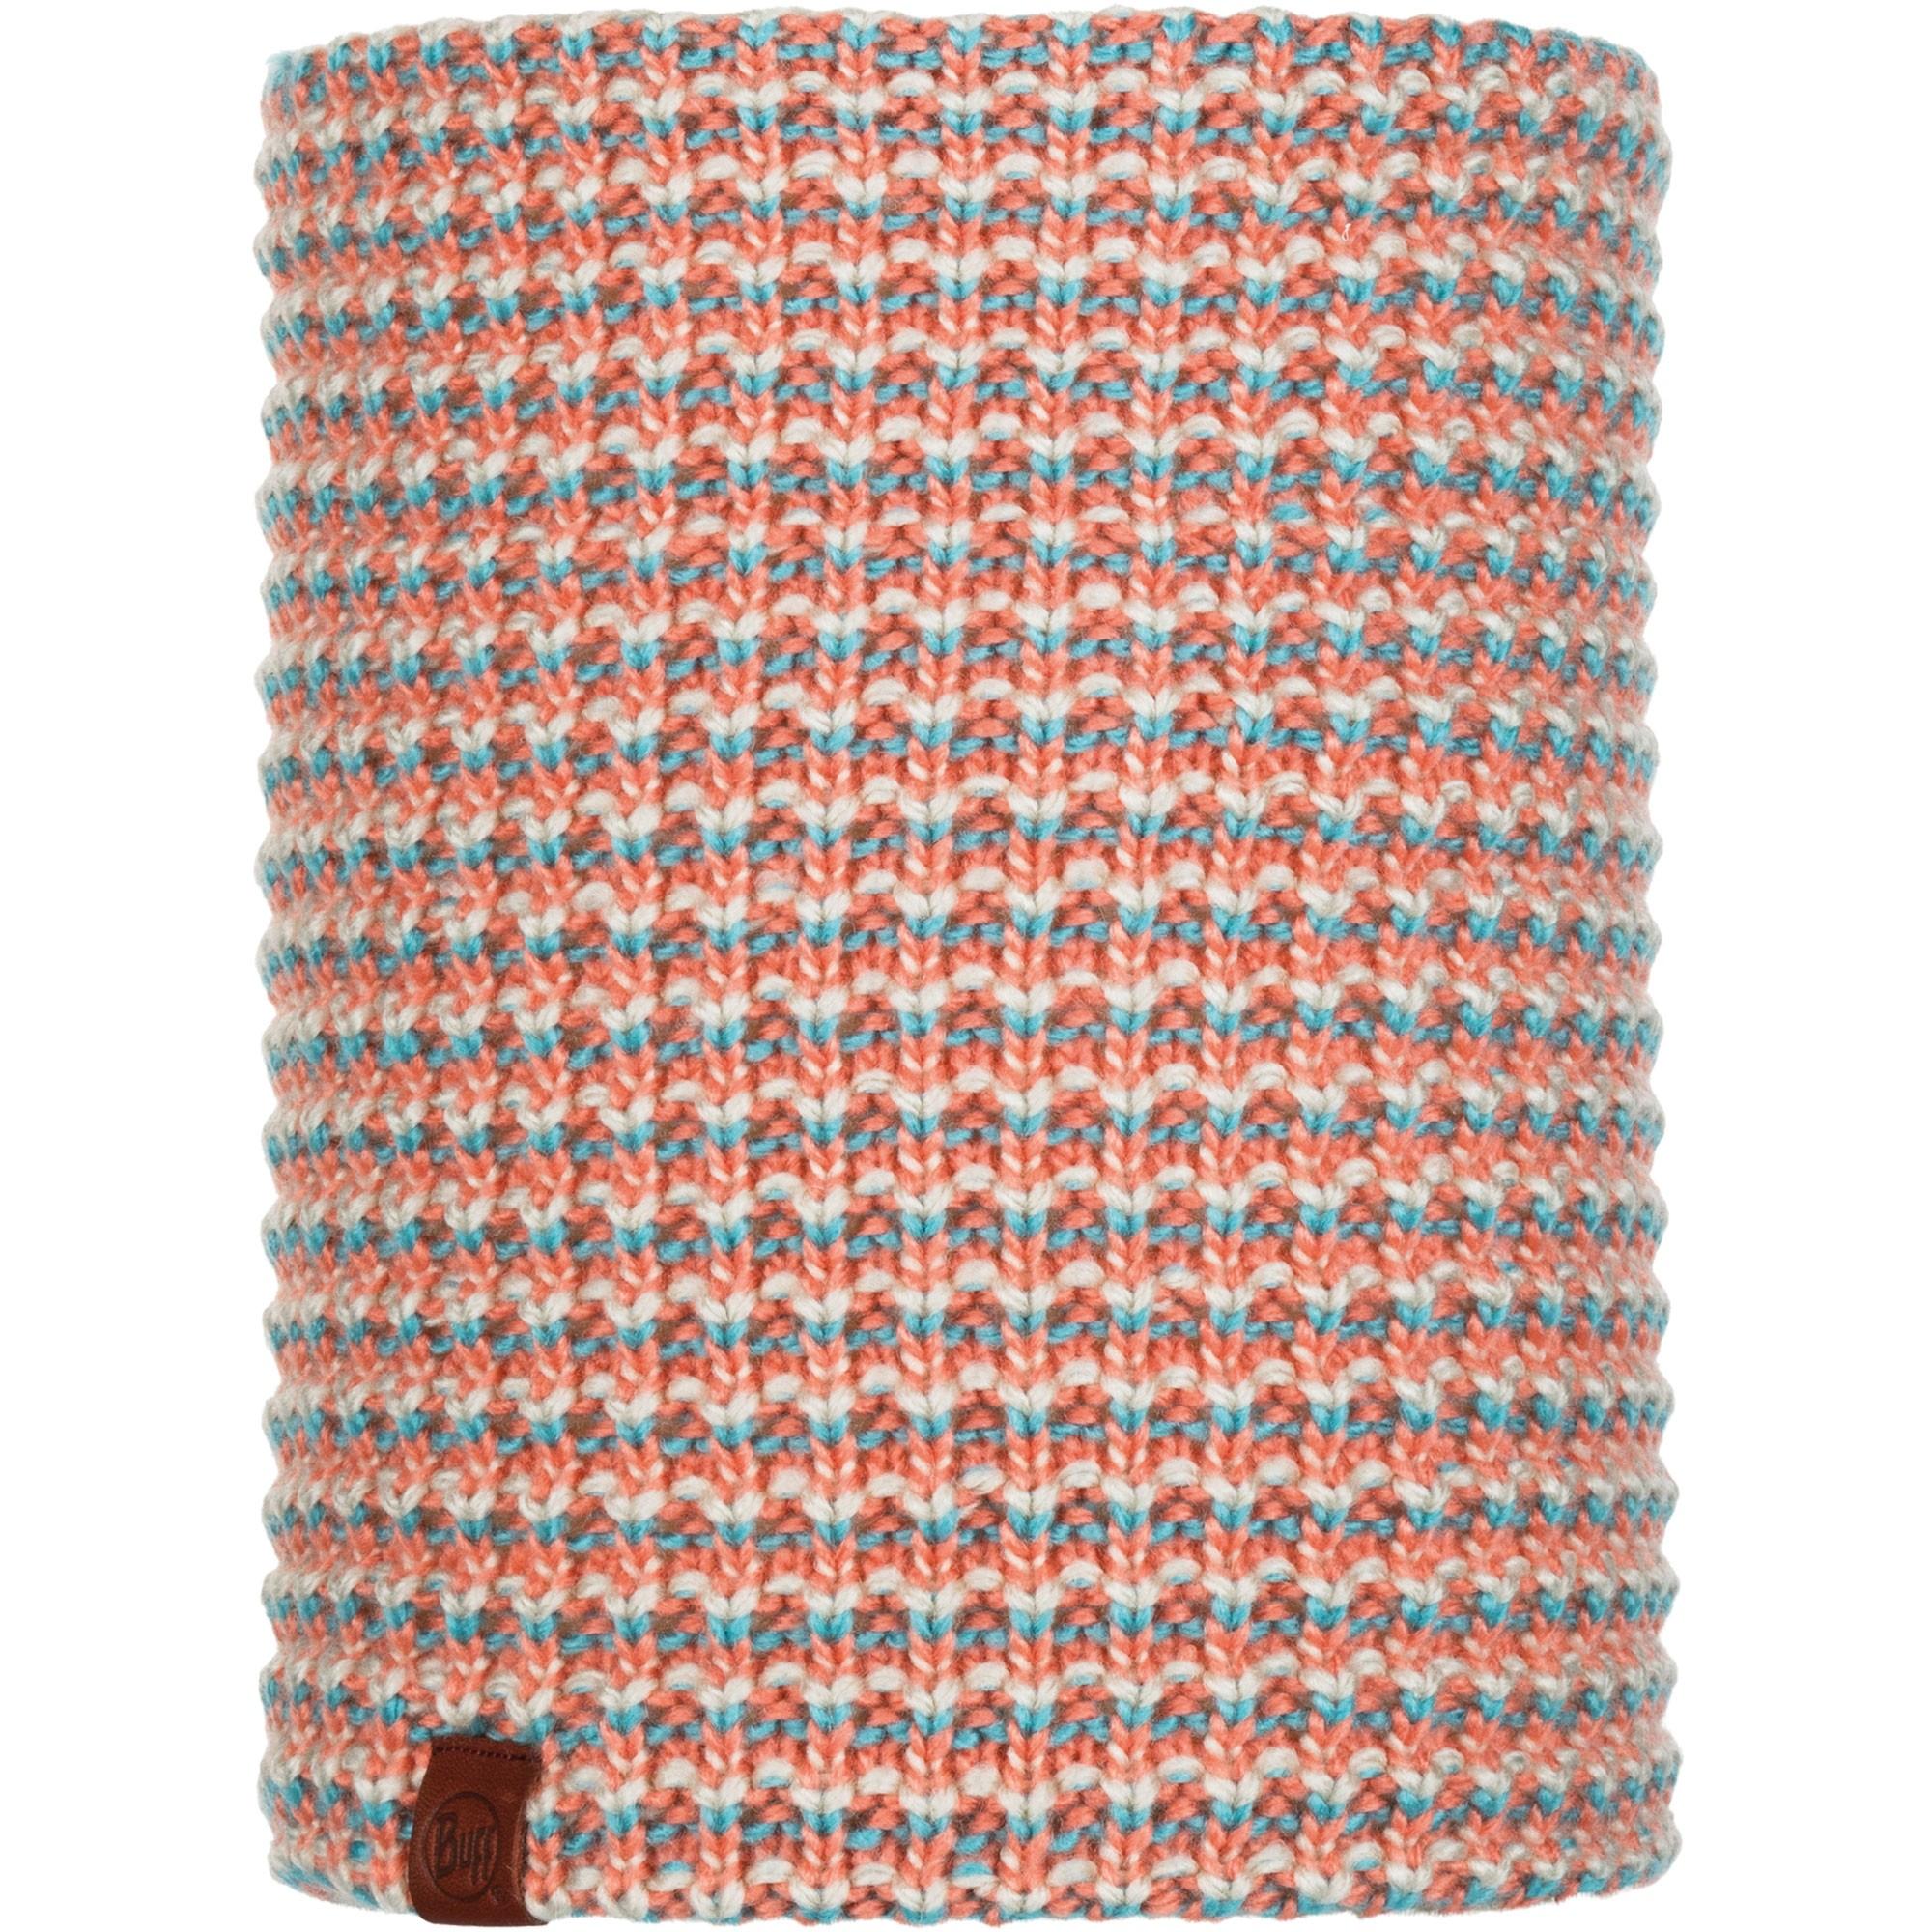 Dana Knitted Neckwarmer - Multi